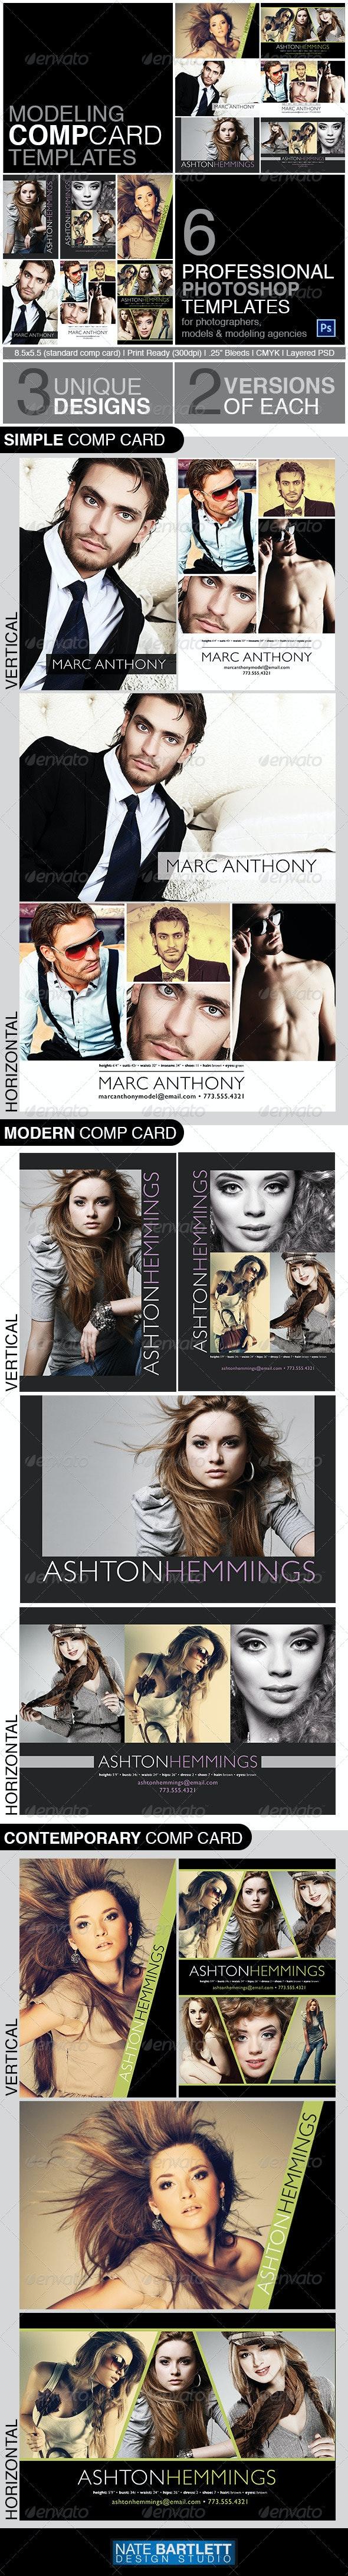 Model Comp Card Template Kit - Miscellaneous Print Templates